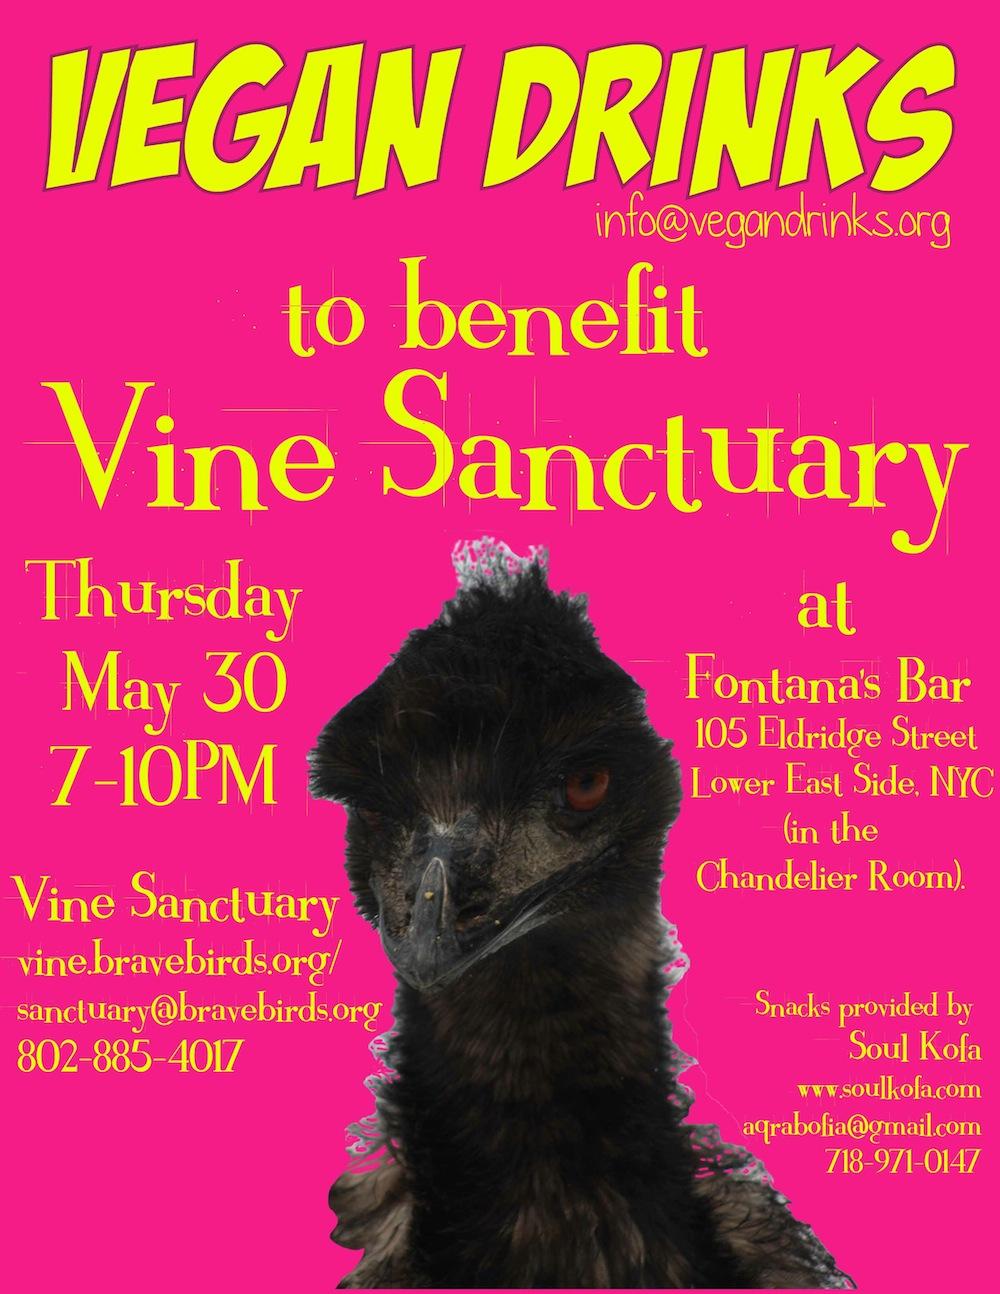 ecc vine vegan drinks flyer.jpg